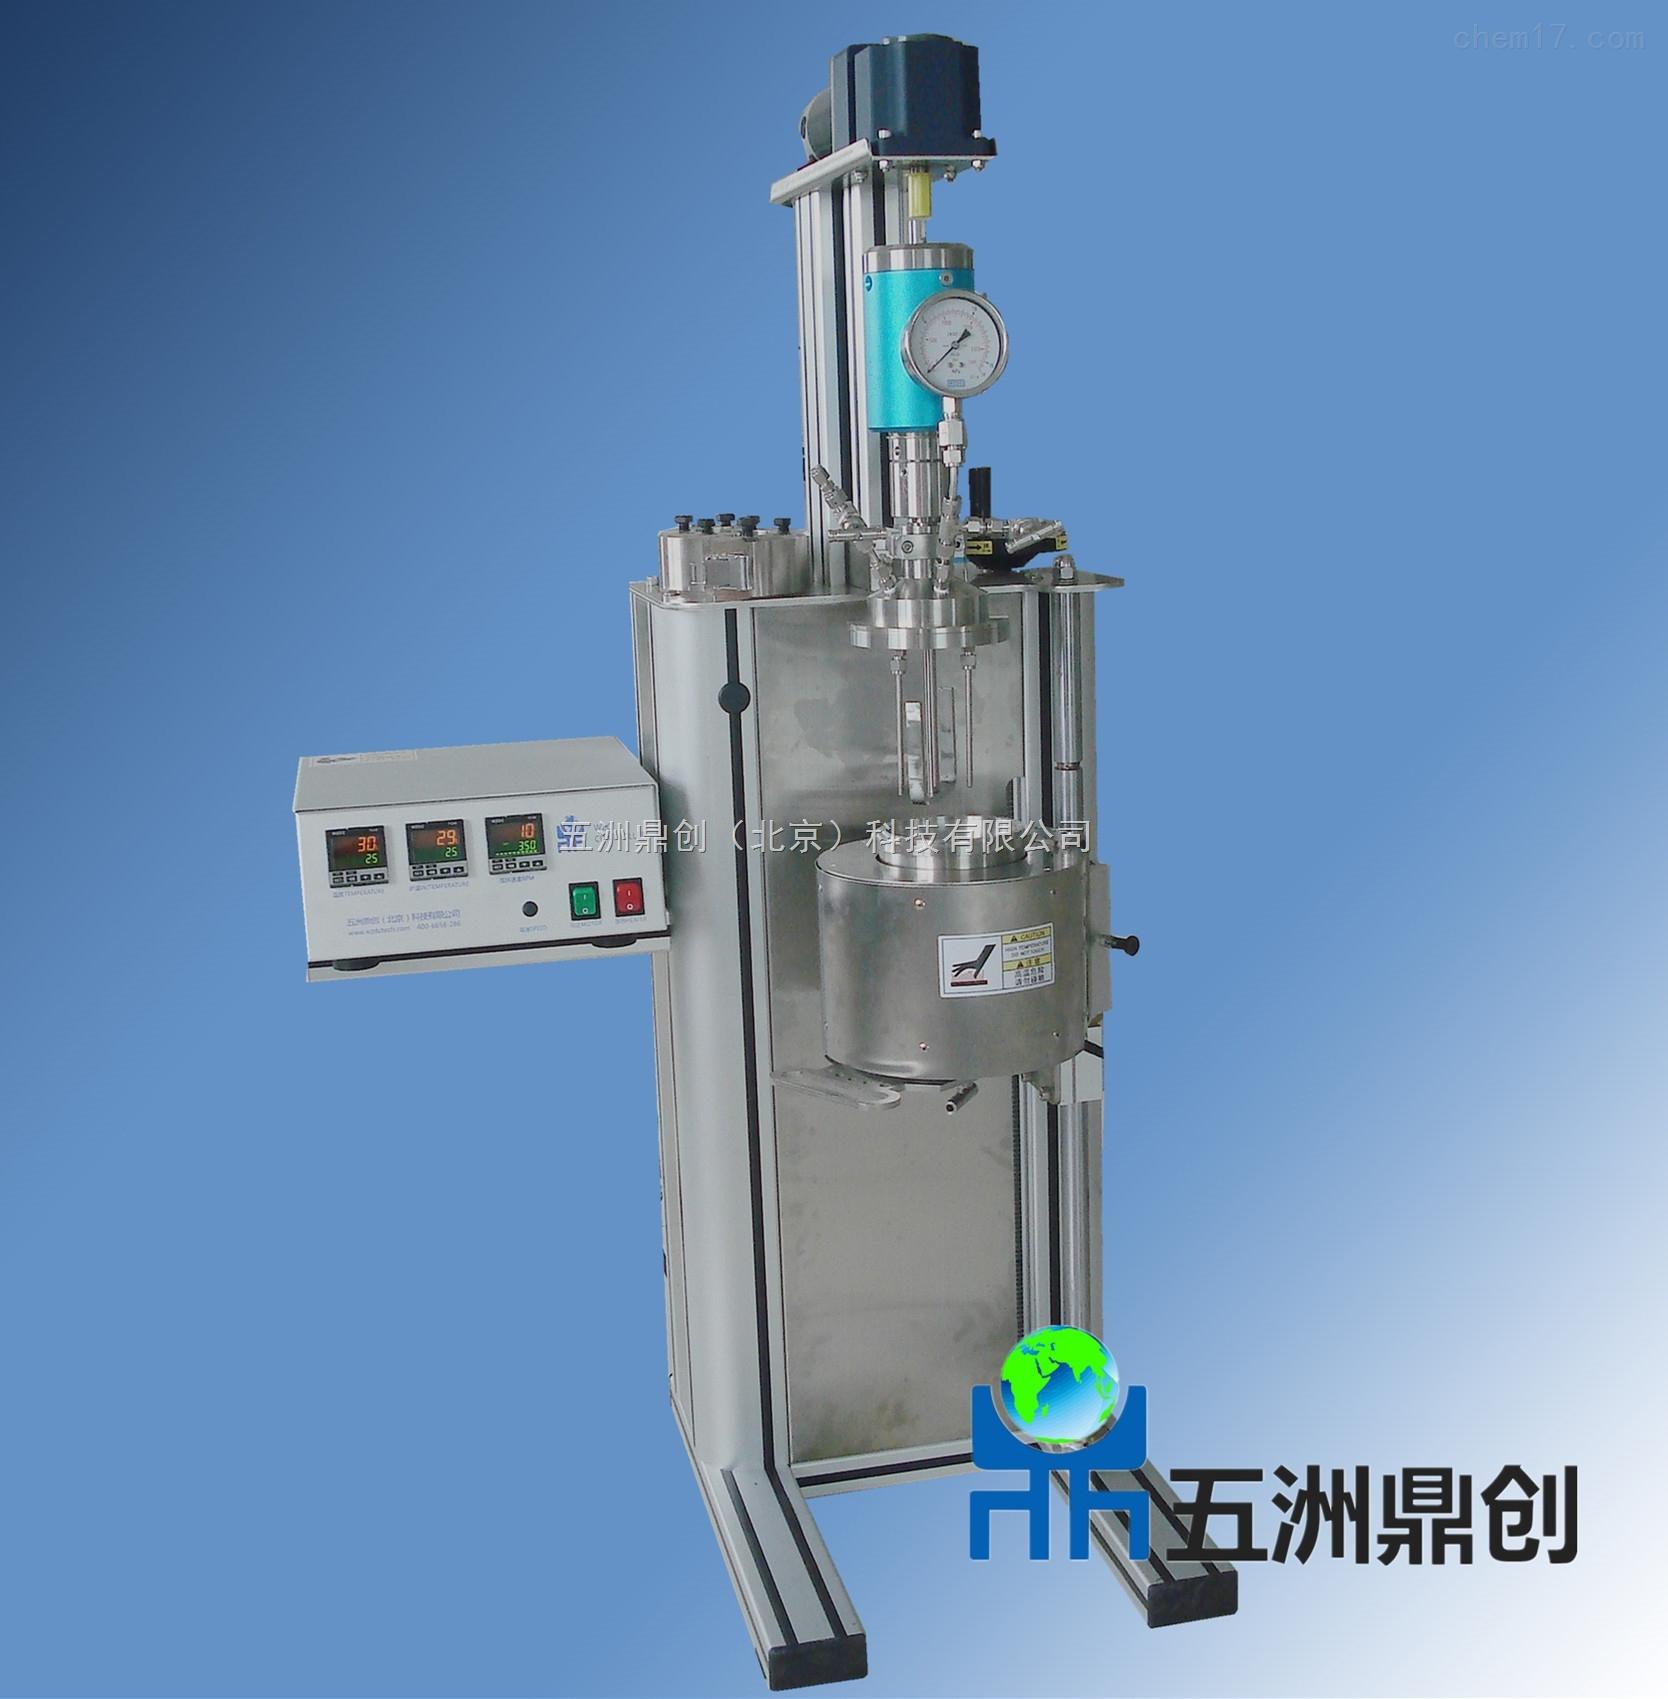 WZ微型高压反应釜 实验室反应仪 磁力搅拌反应